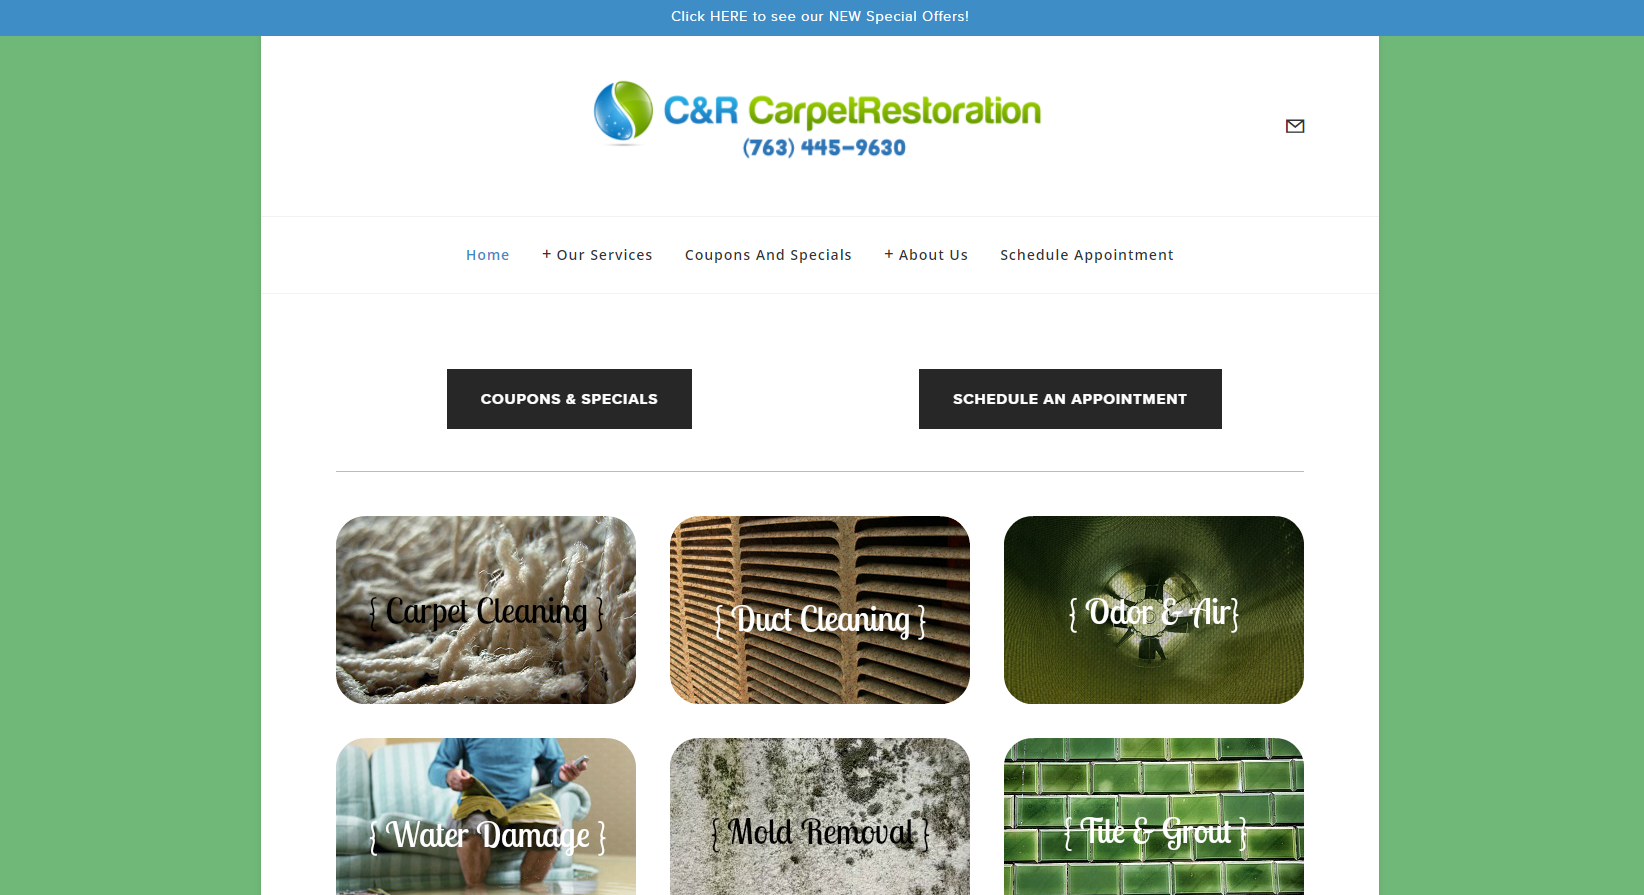 C&R Carpet Restoration